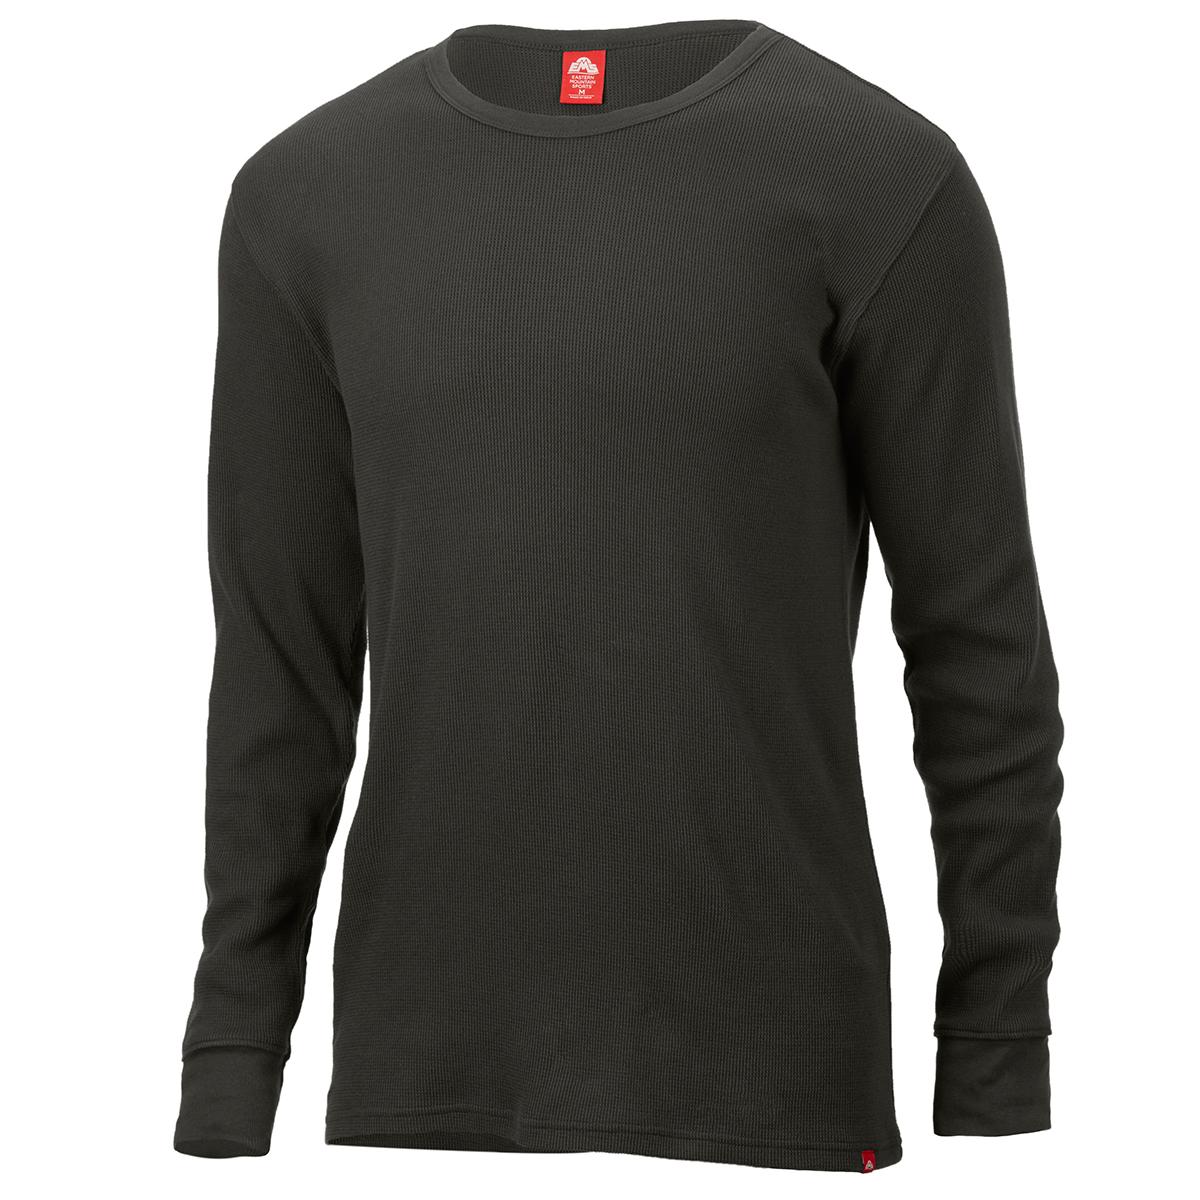 Ems Men's Rowan Waffle Crew Long-Sleeve Shirt - Green, XL